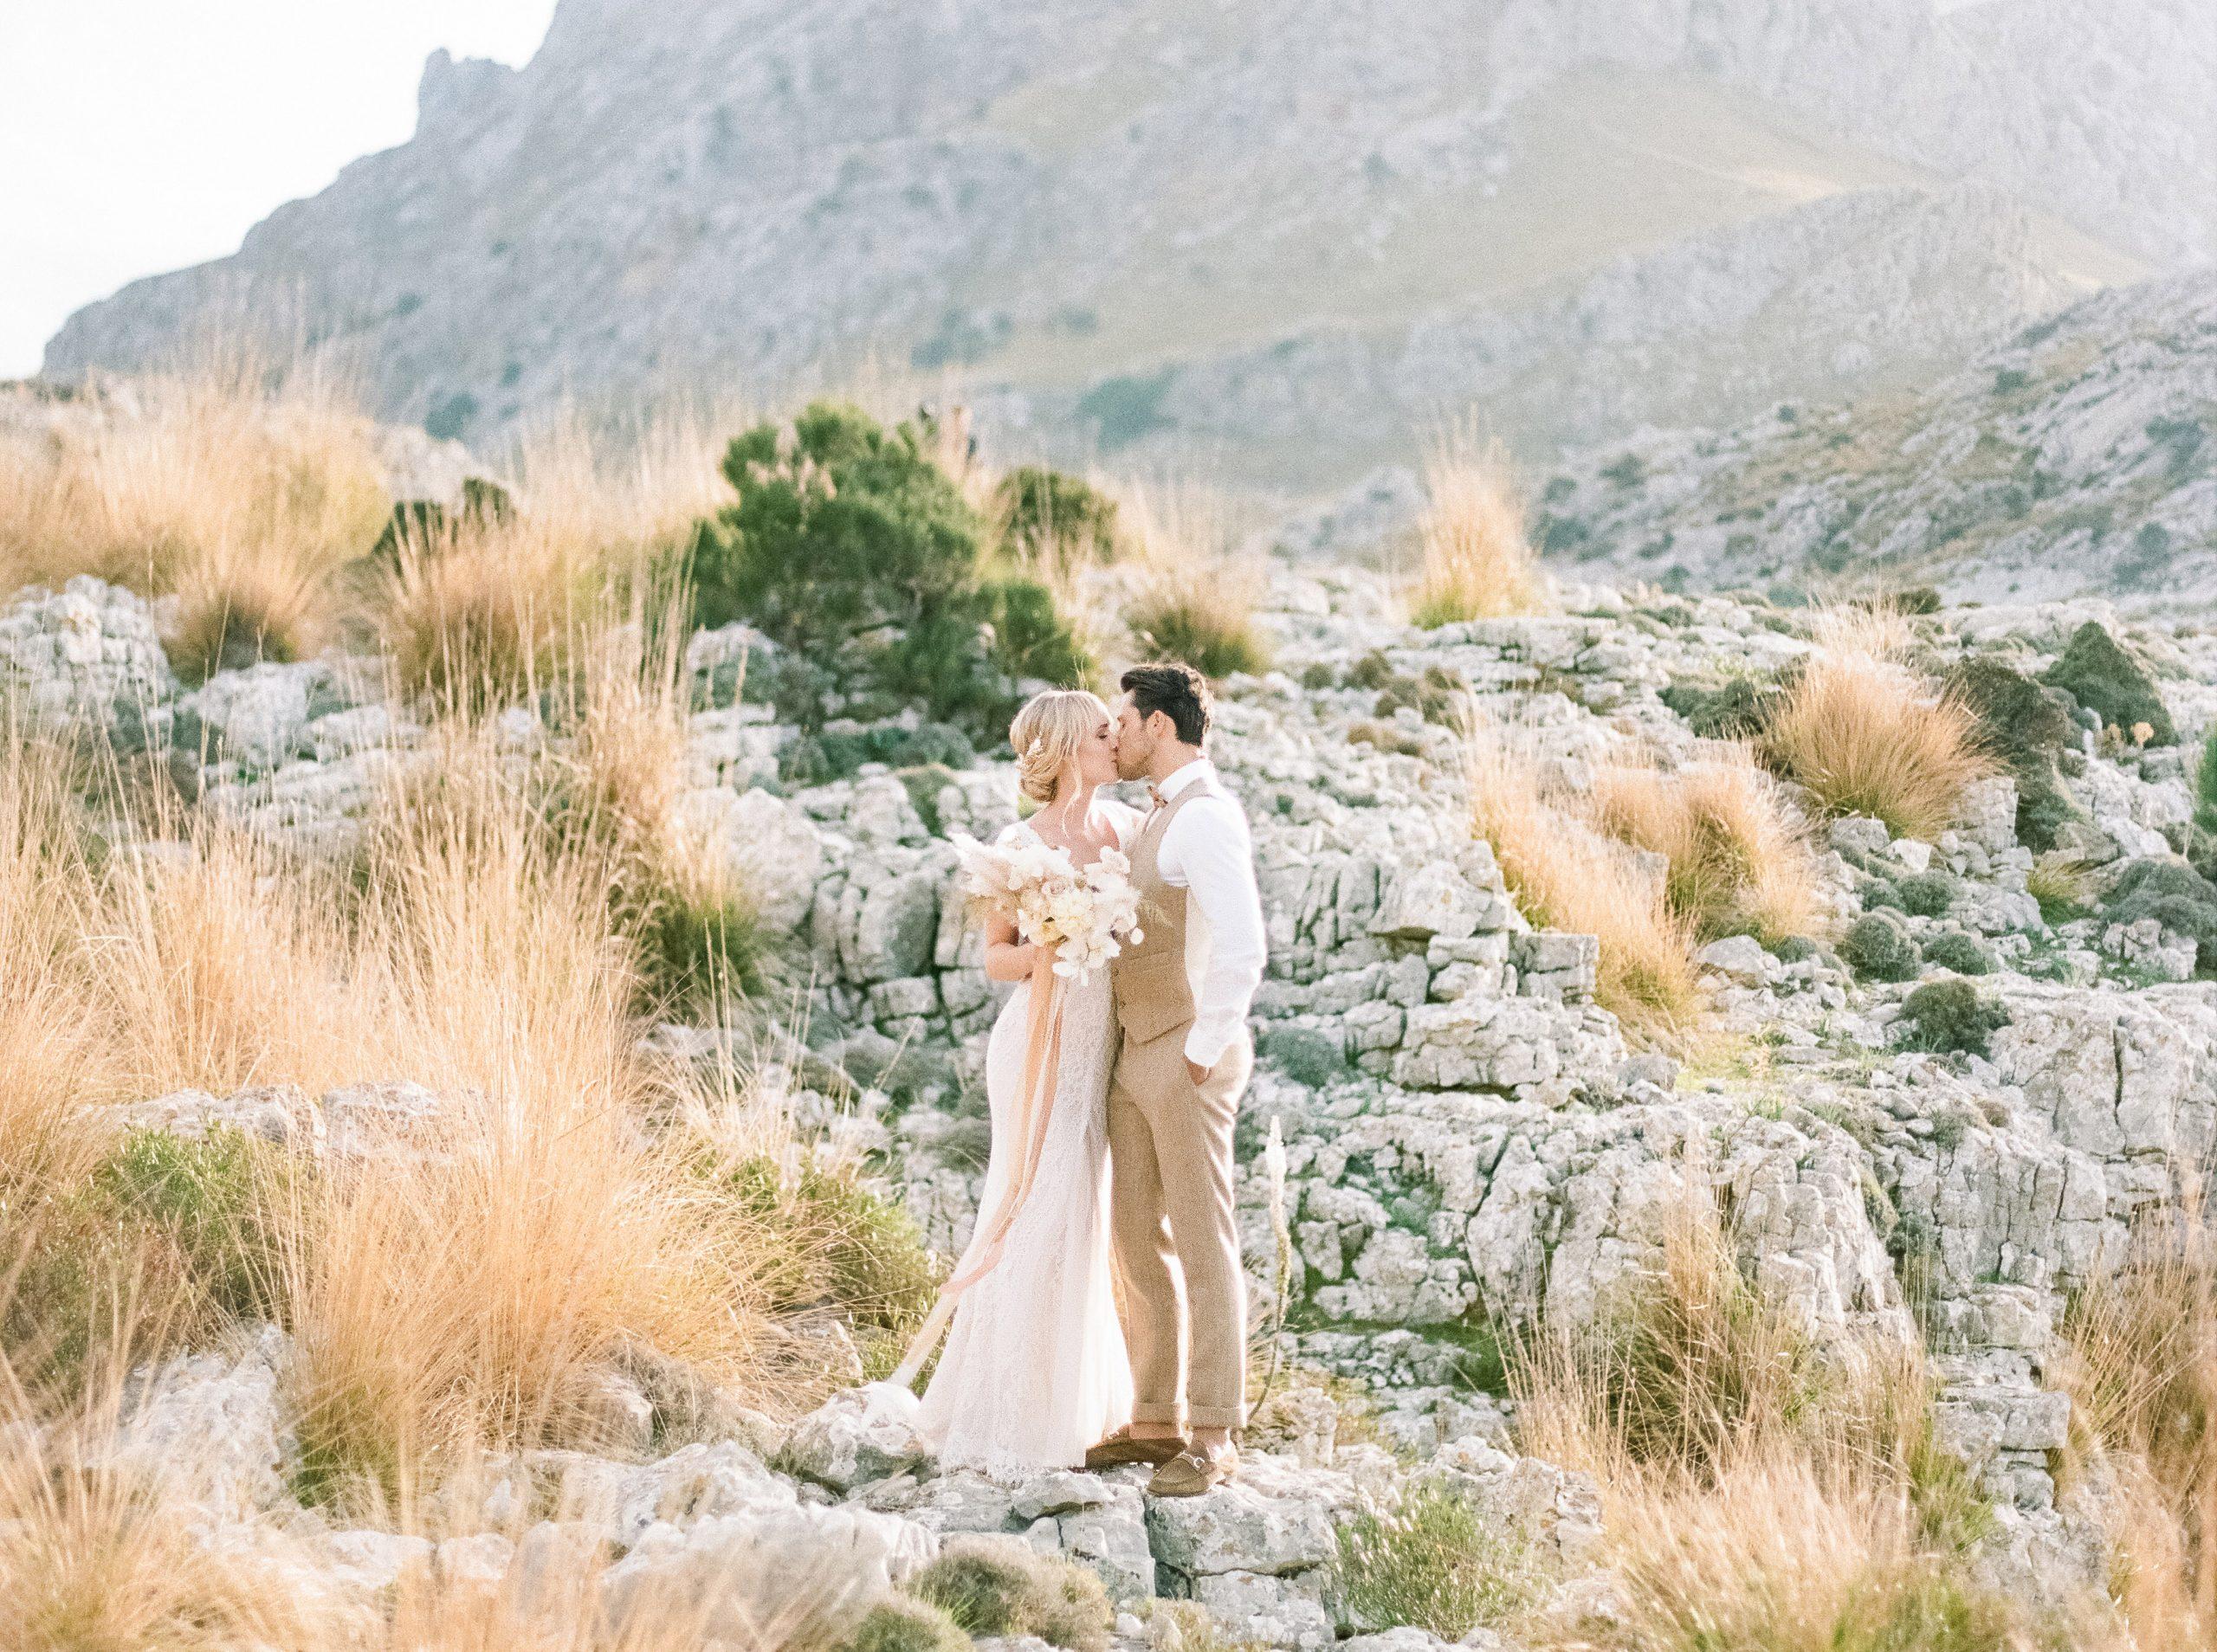 Brautpaar, Destination Wedding, Embrace Your Love, Hochzeitsplanung